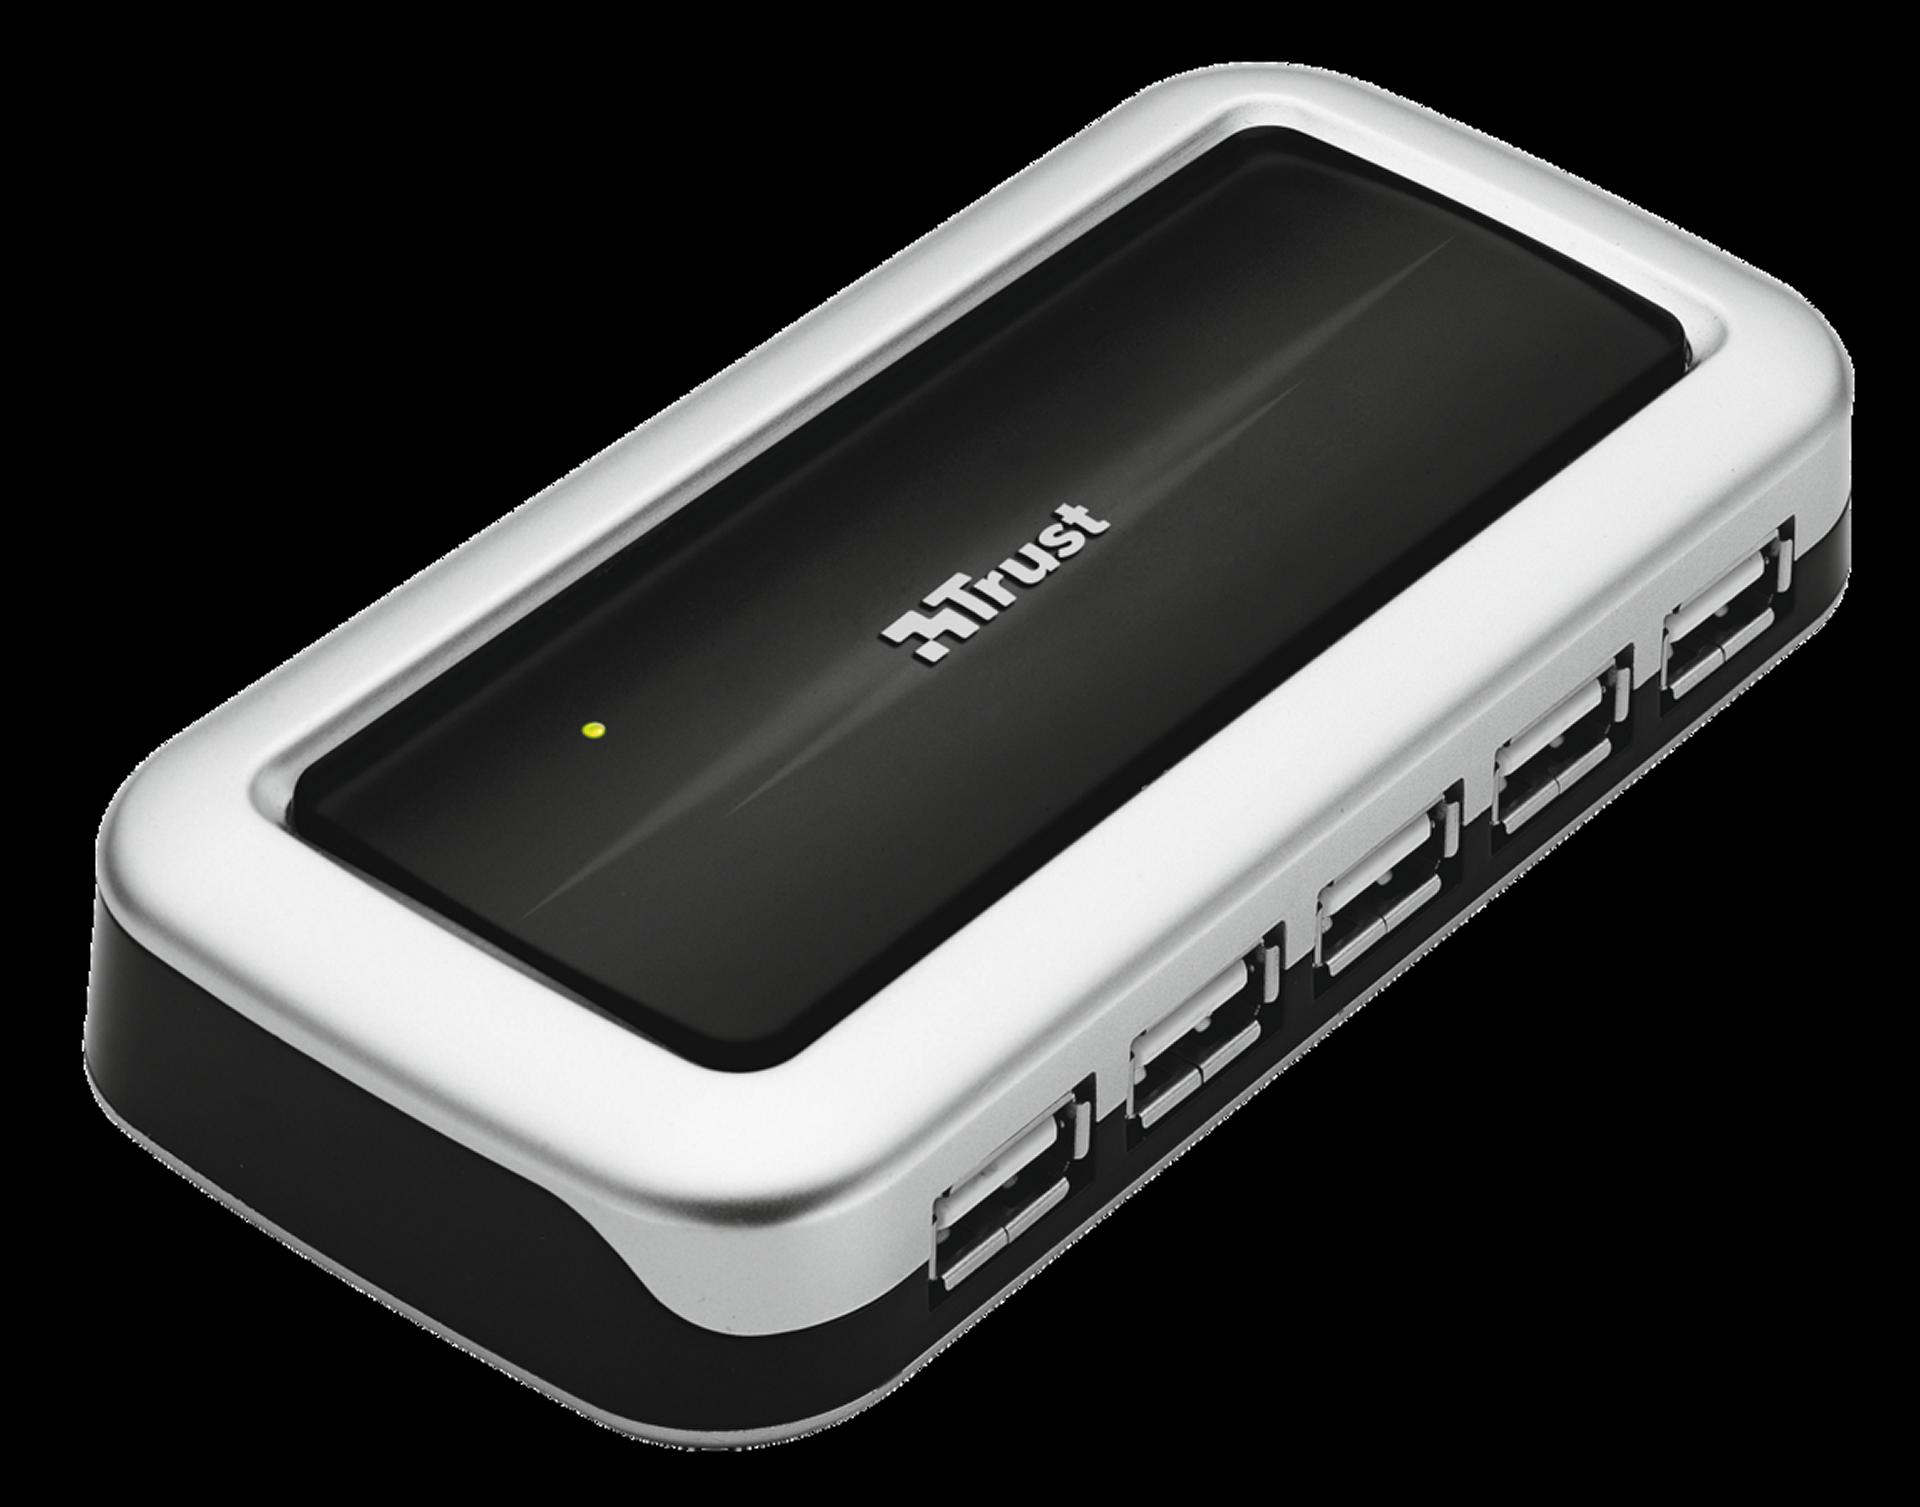 Rozbočovač TRUST 10 Port USB 2.0 Desktop Hub